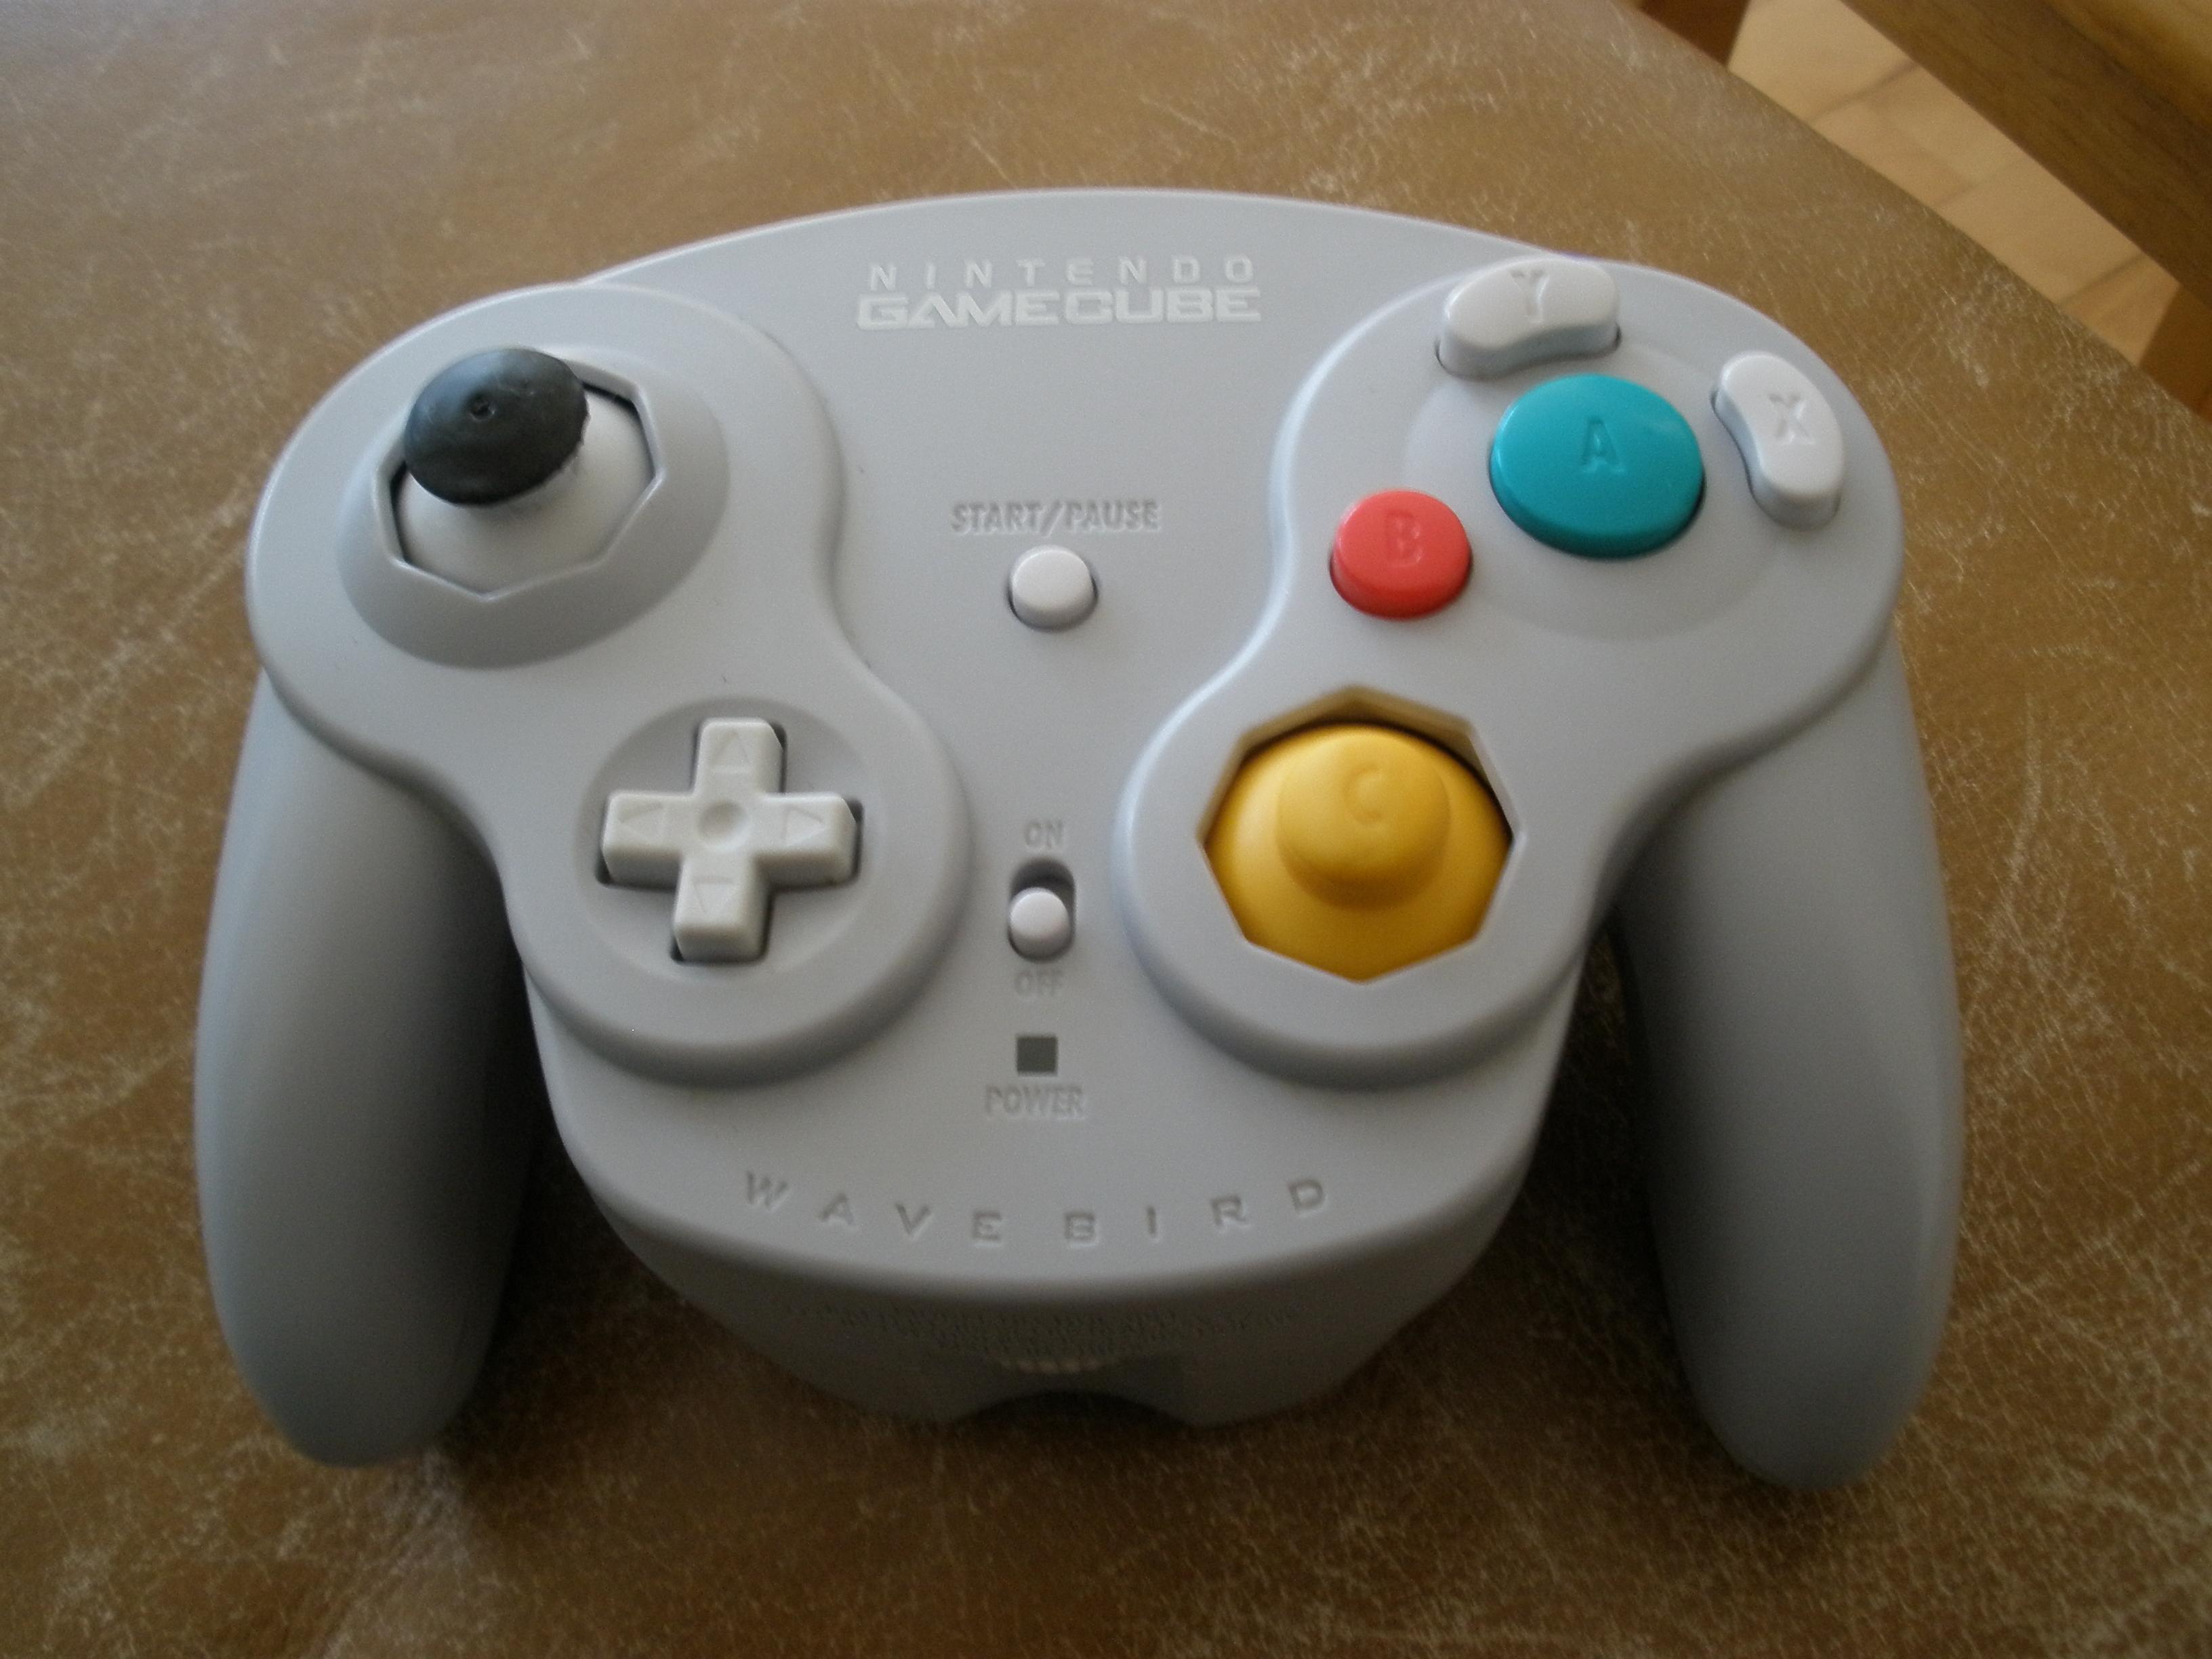 Picture of Repairing Joystick/Thumbpad on Gamecube Controller